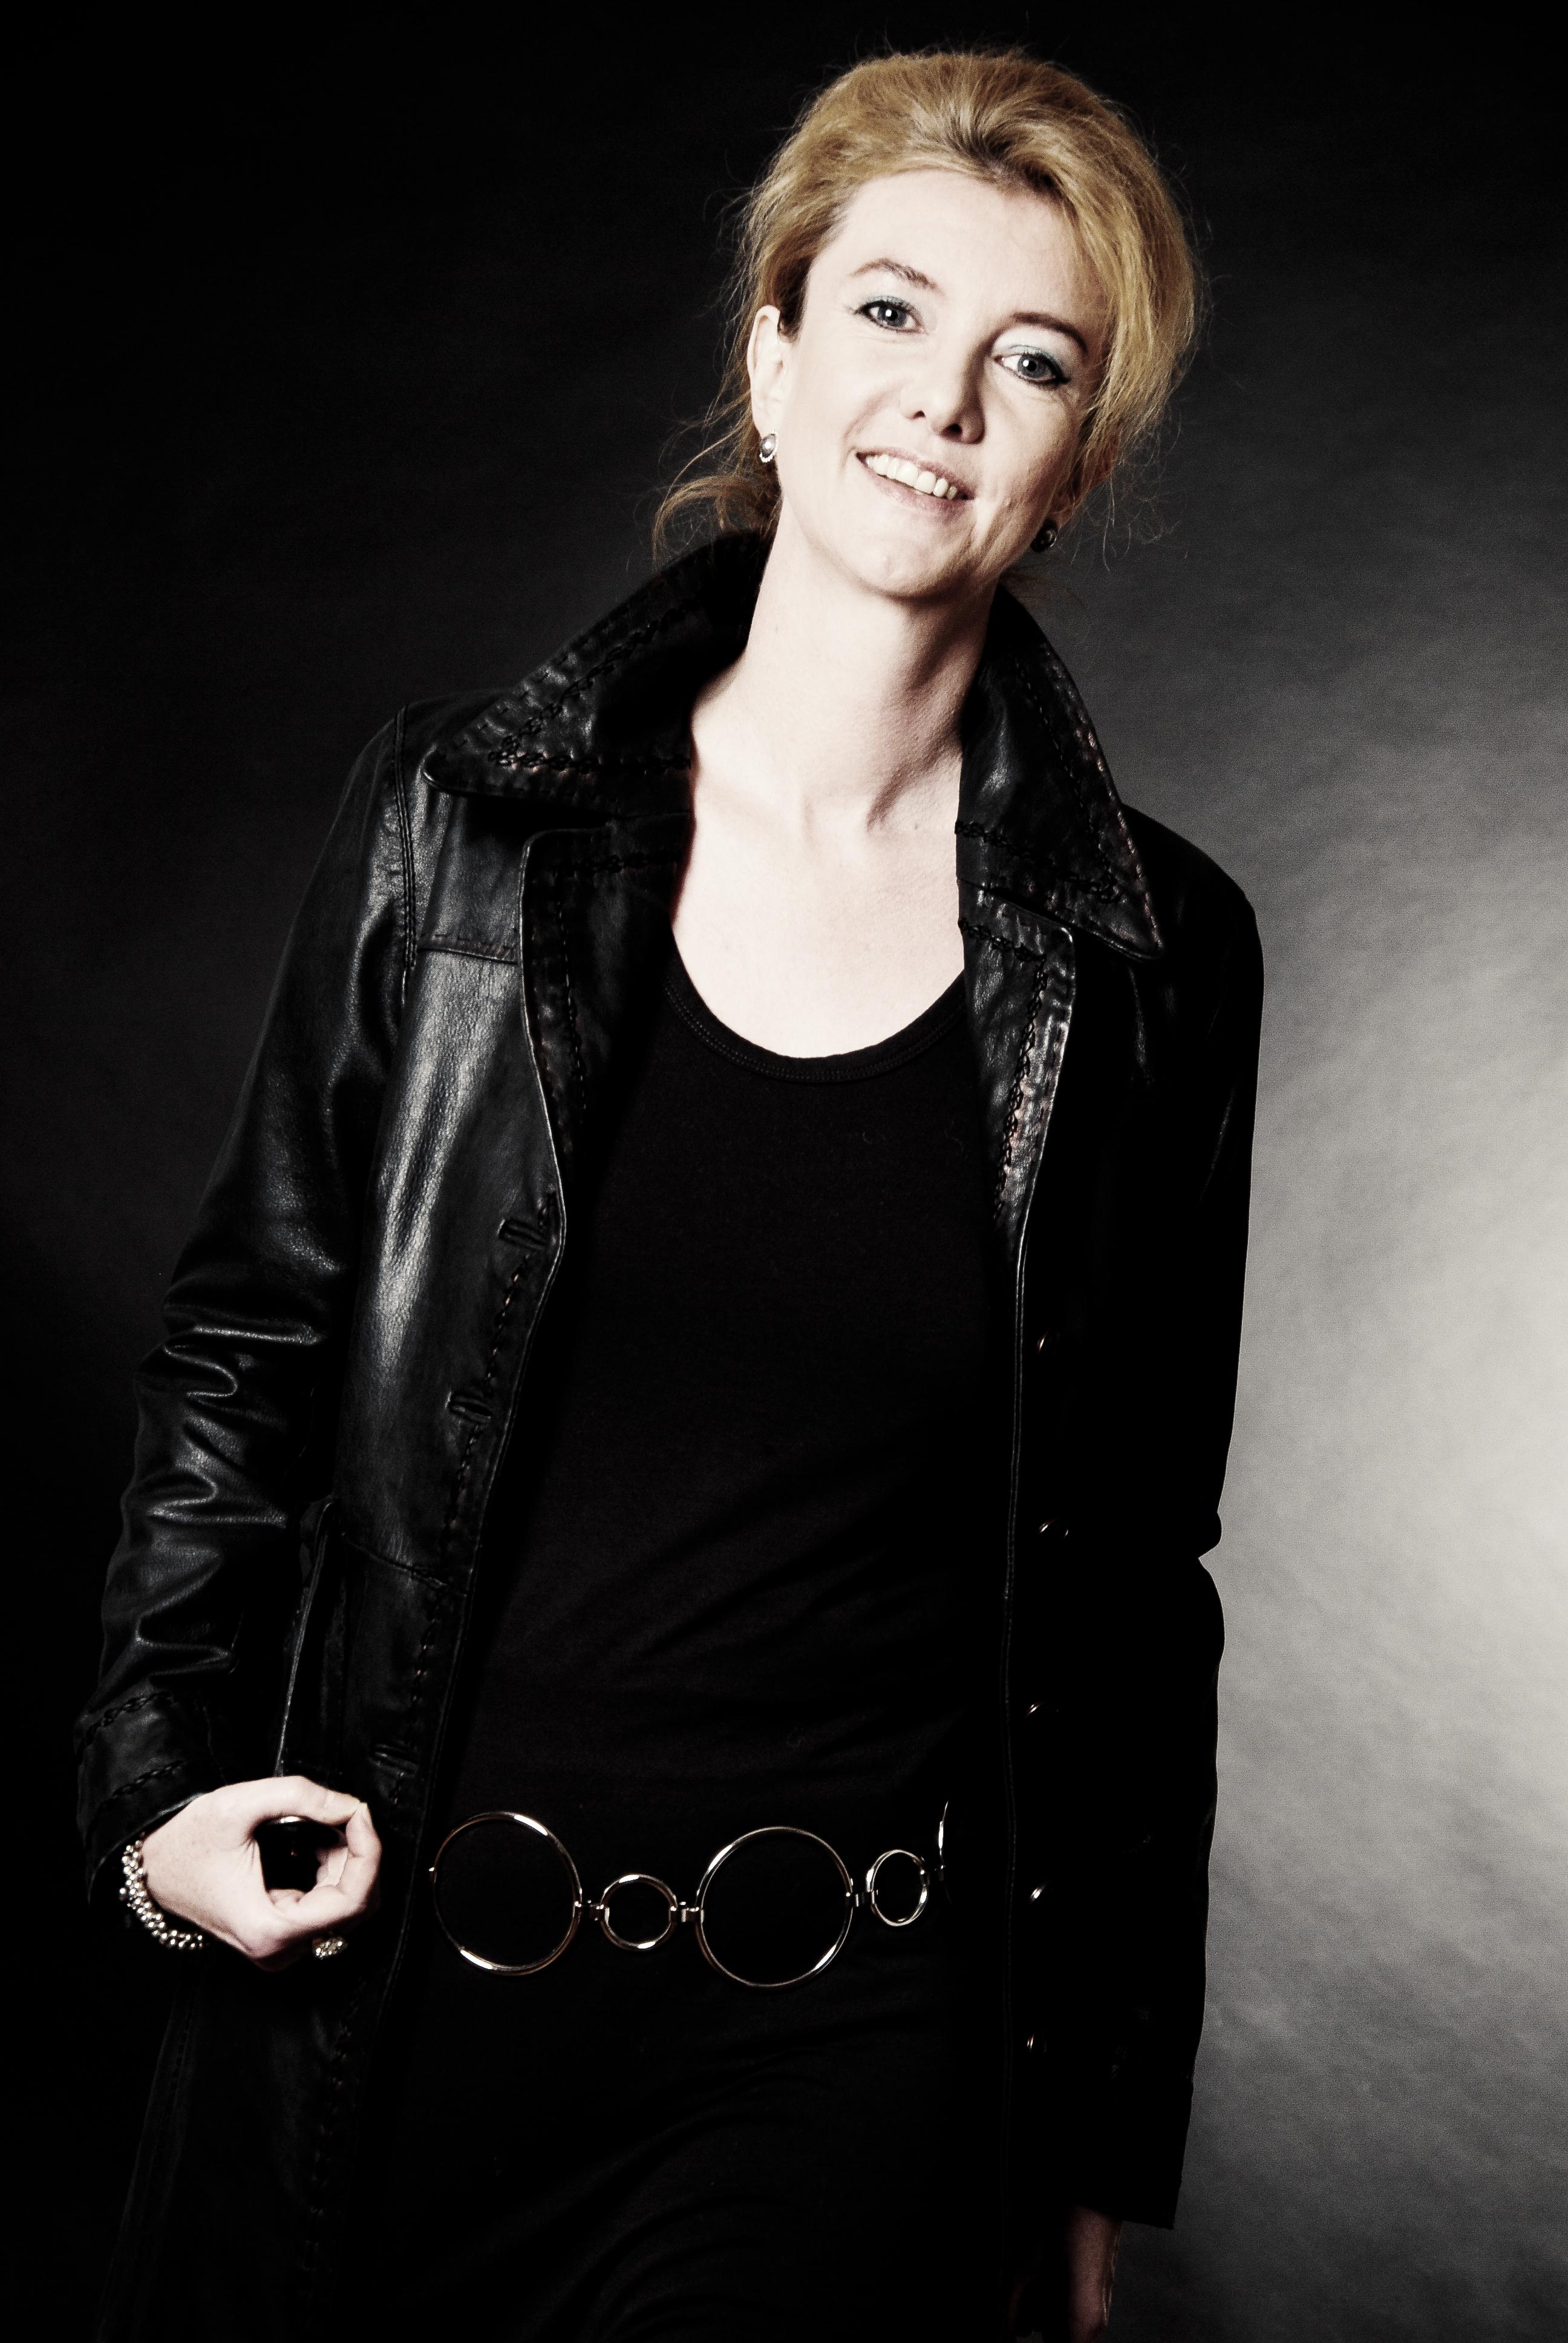 Frauen Portraits_ Nadine Grenningloh 031